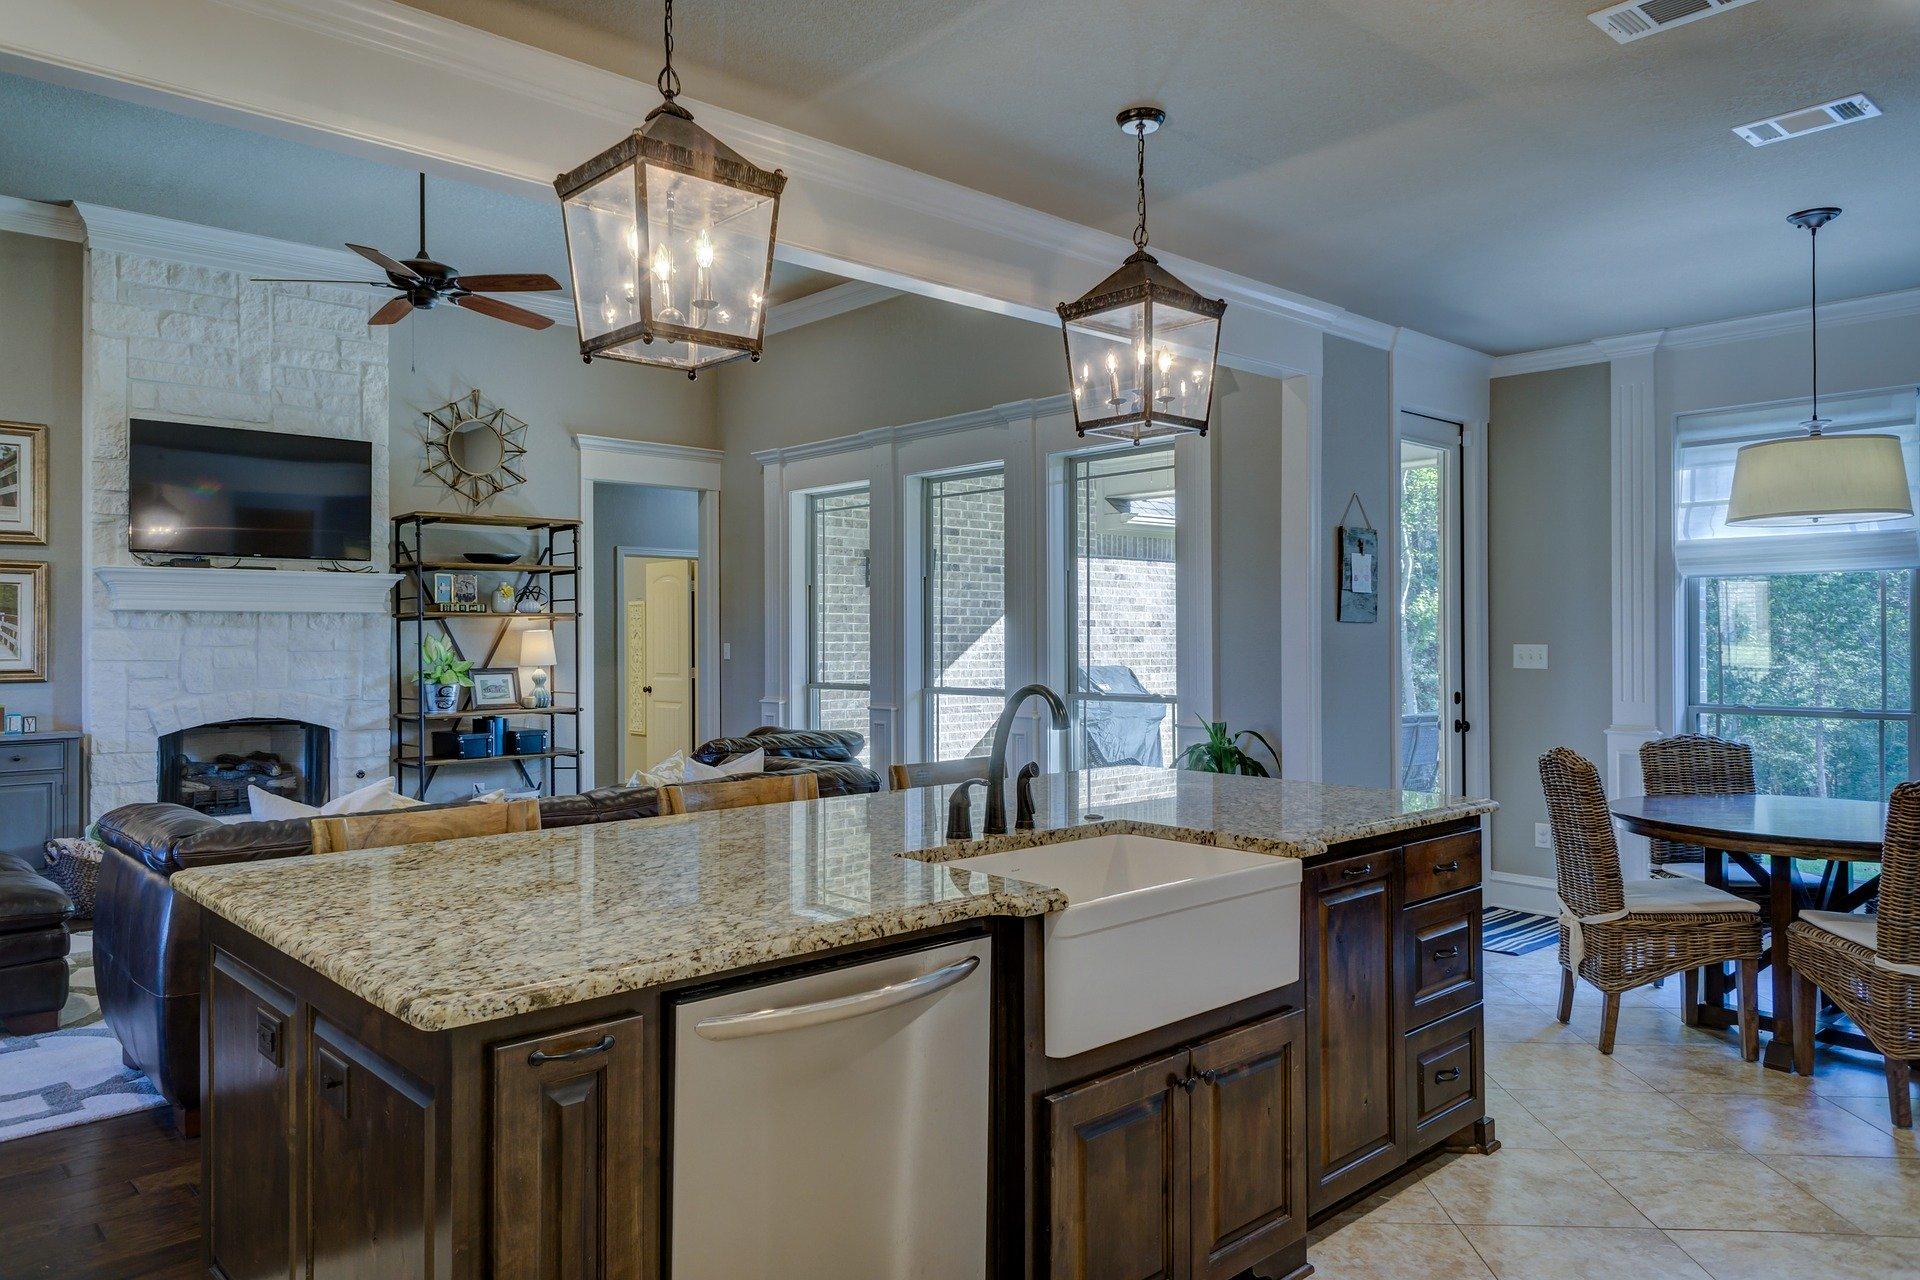 Value Added Interior Remodeling Upgrades